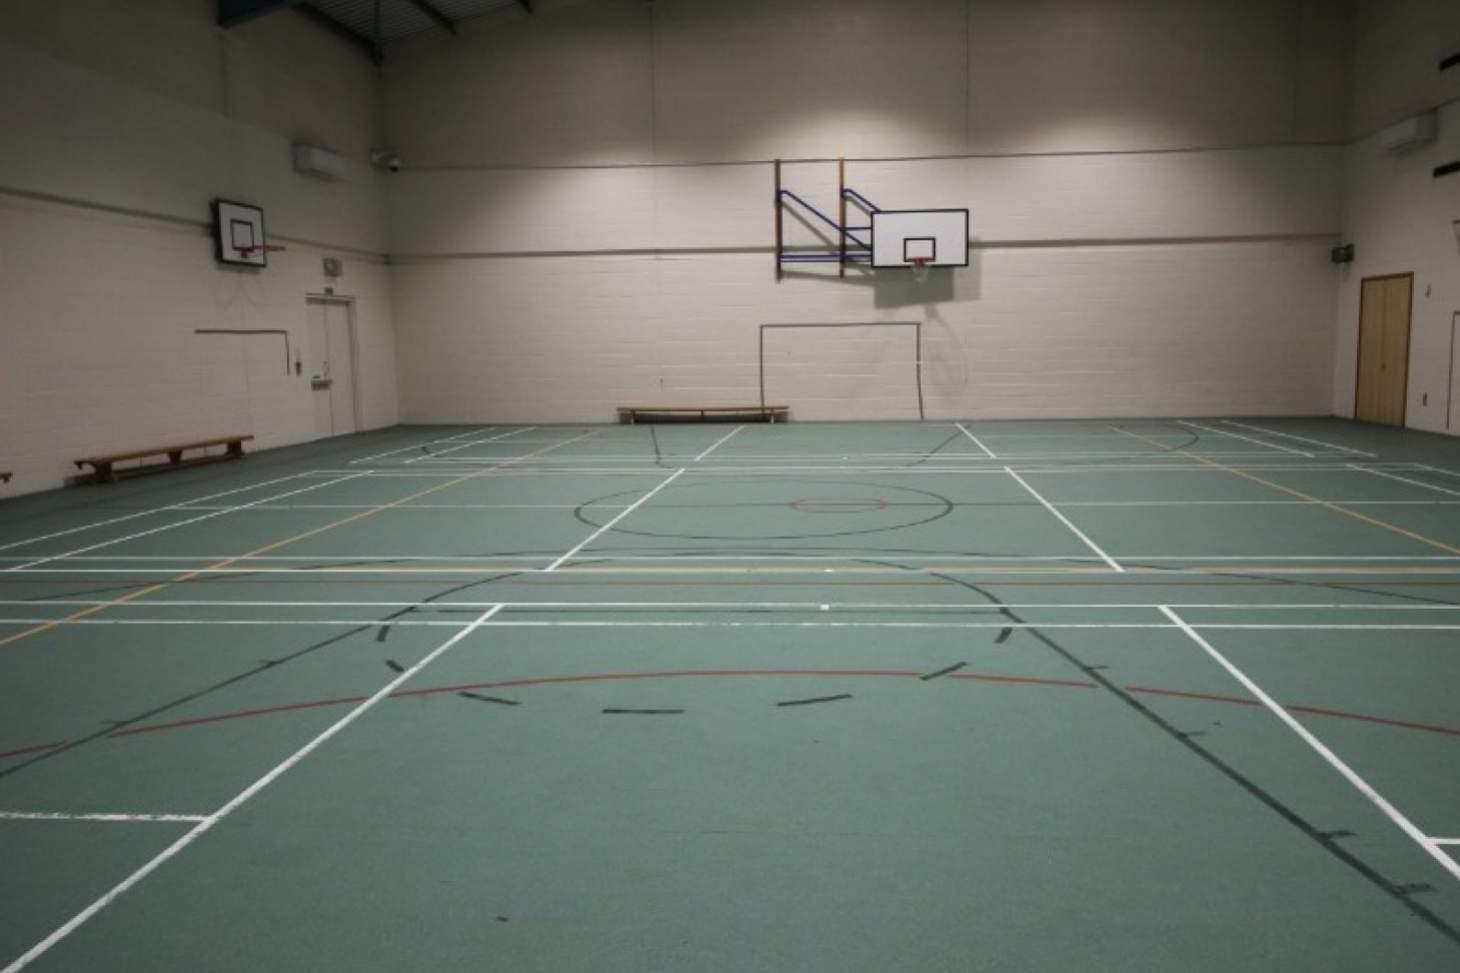 St James Catholic High School Indoor basketball court